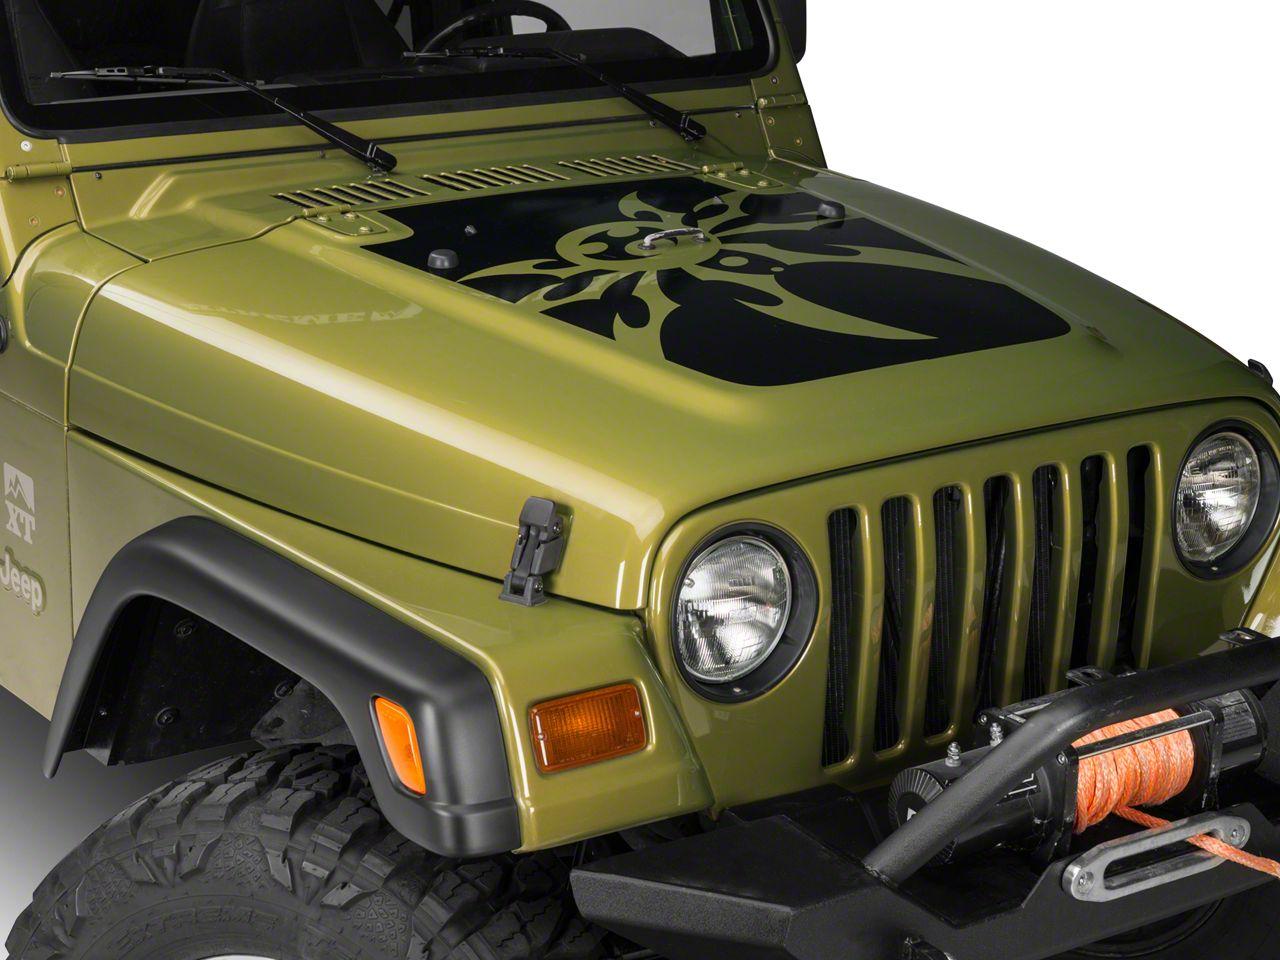 Poison Spyder Mountain Spyder Hood Decal - Black (97-06 Jeep Wrangler TJ)